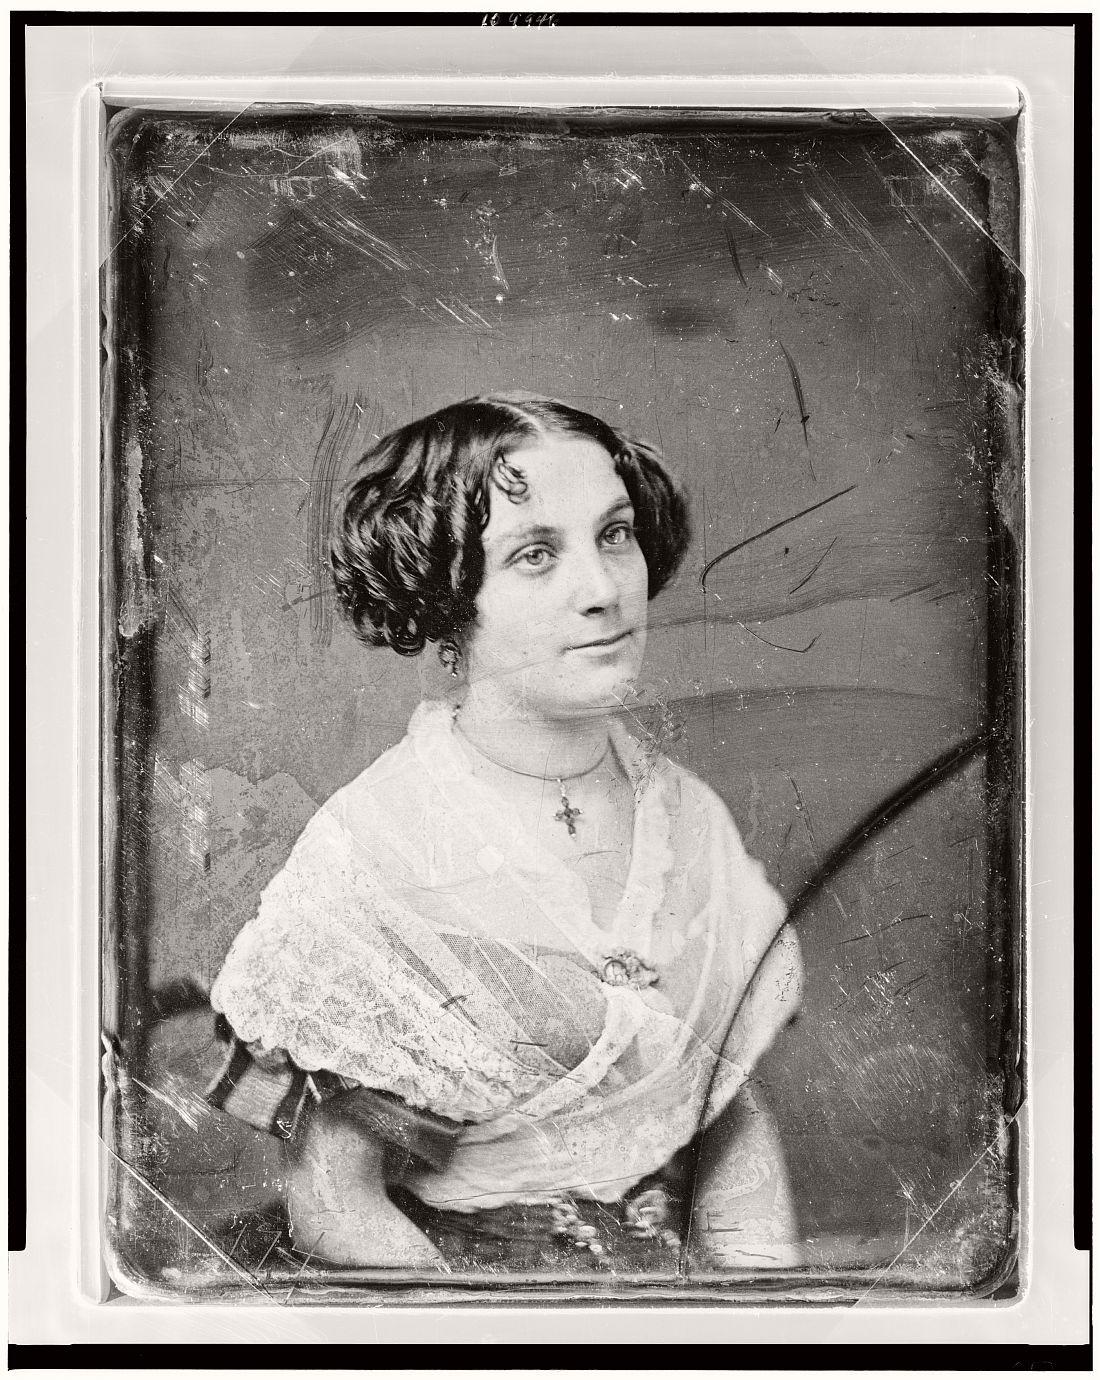 vintage-daguerreotype-portraits-from-xix-century-1844-1860-31